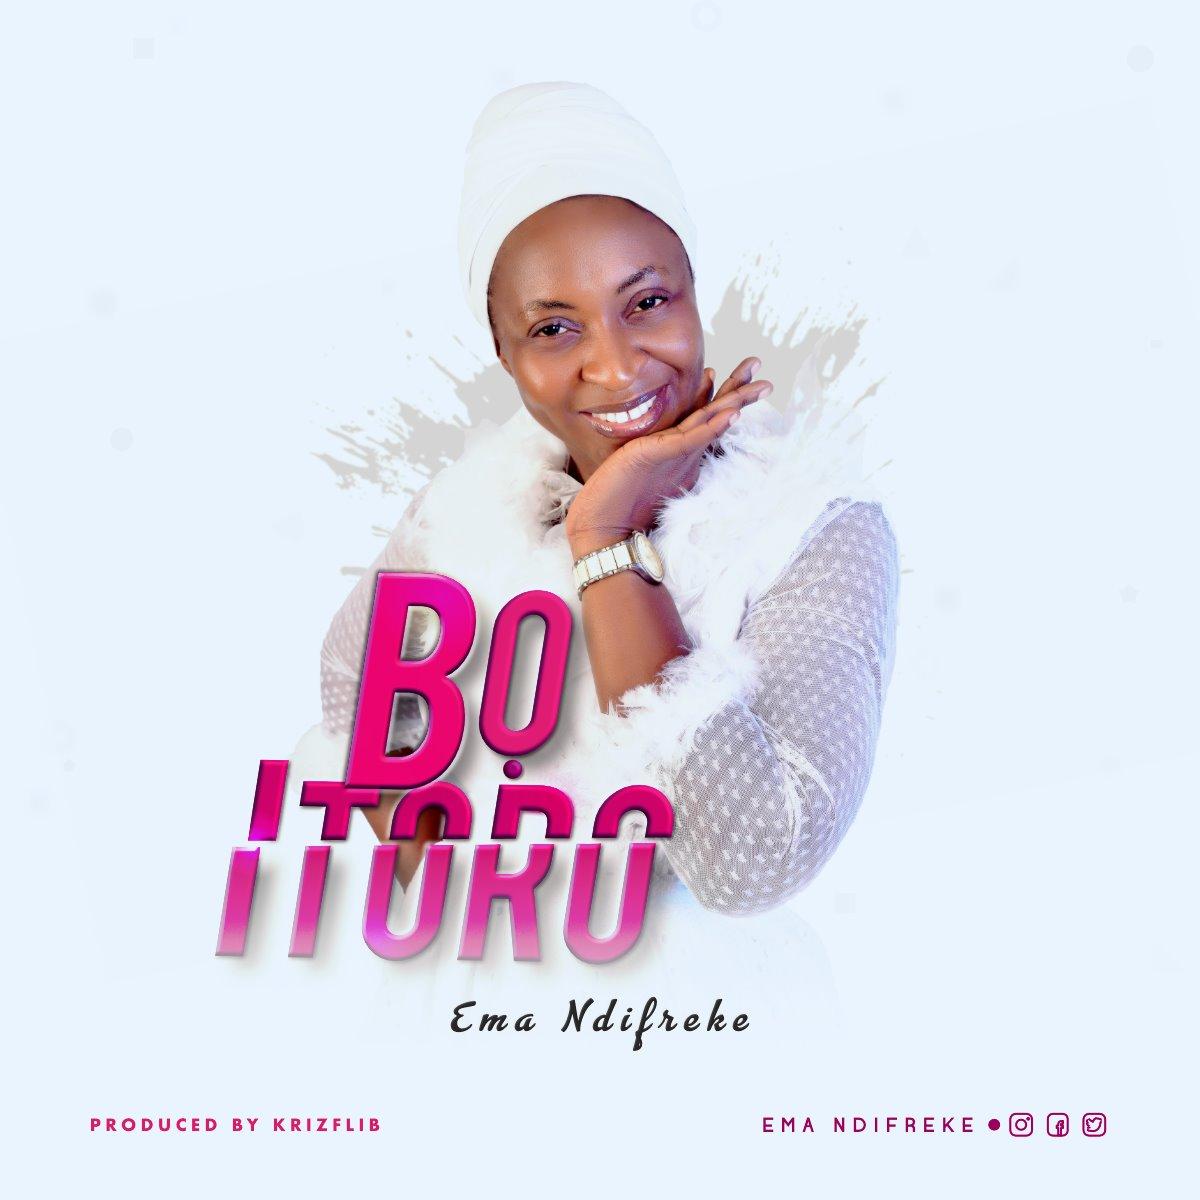 Bo Itoro Art - Ema Ndifreke